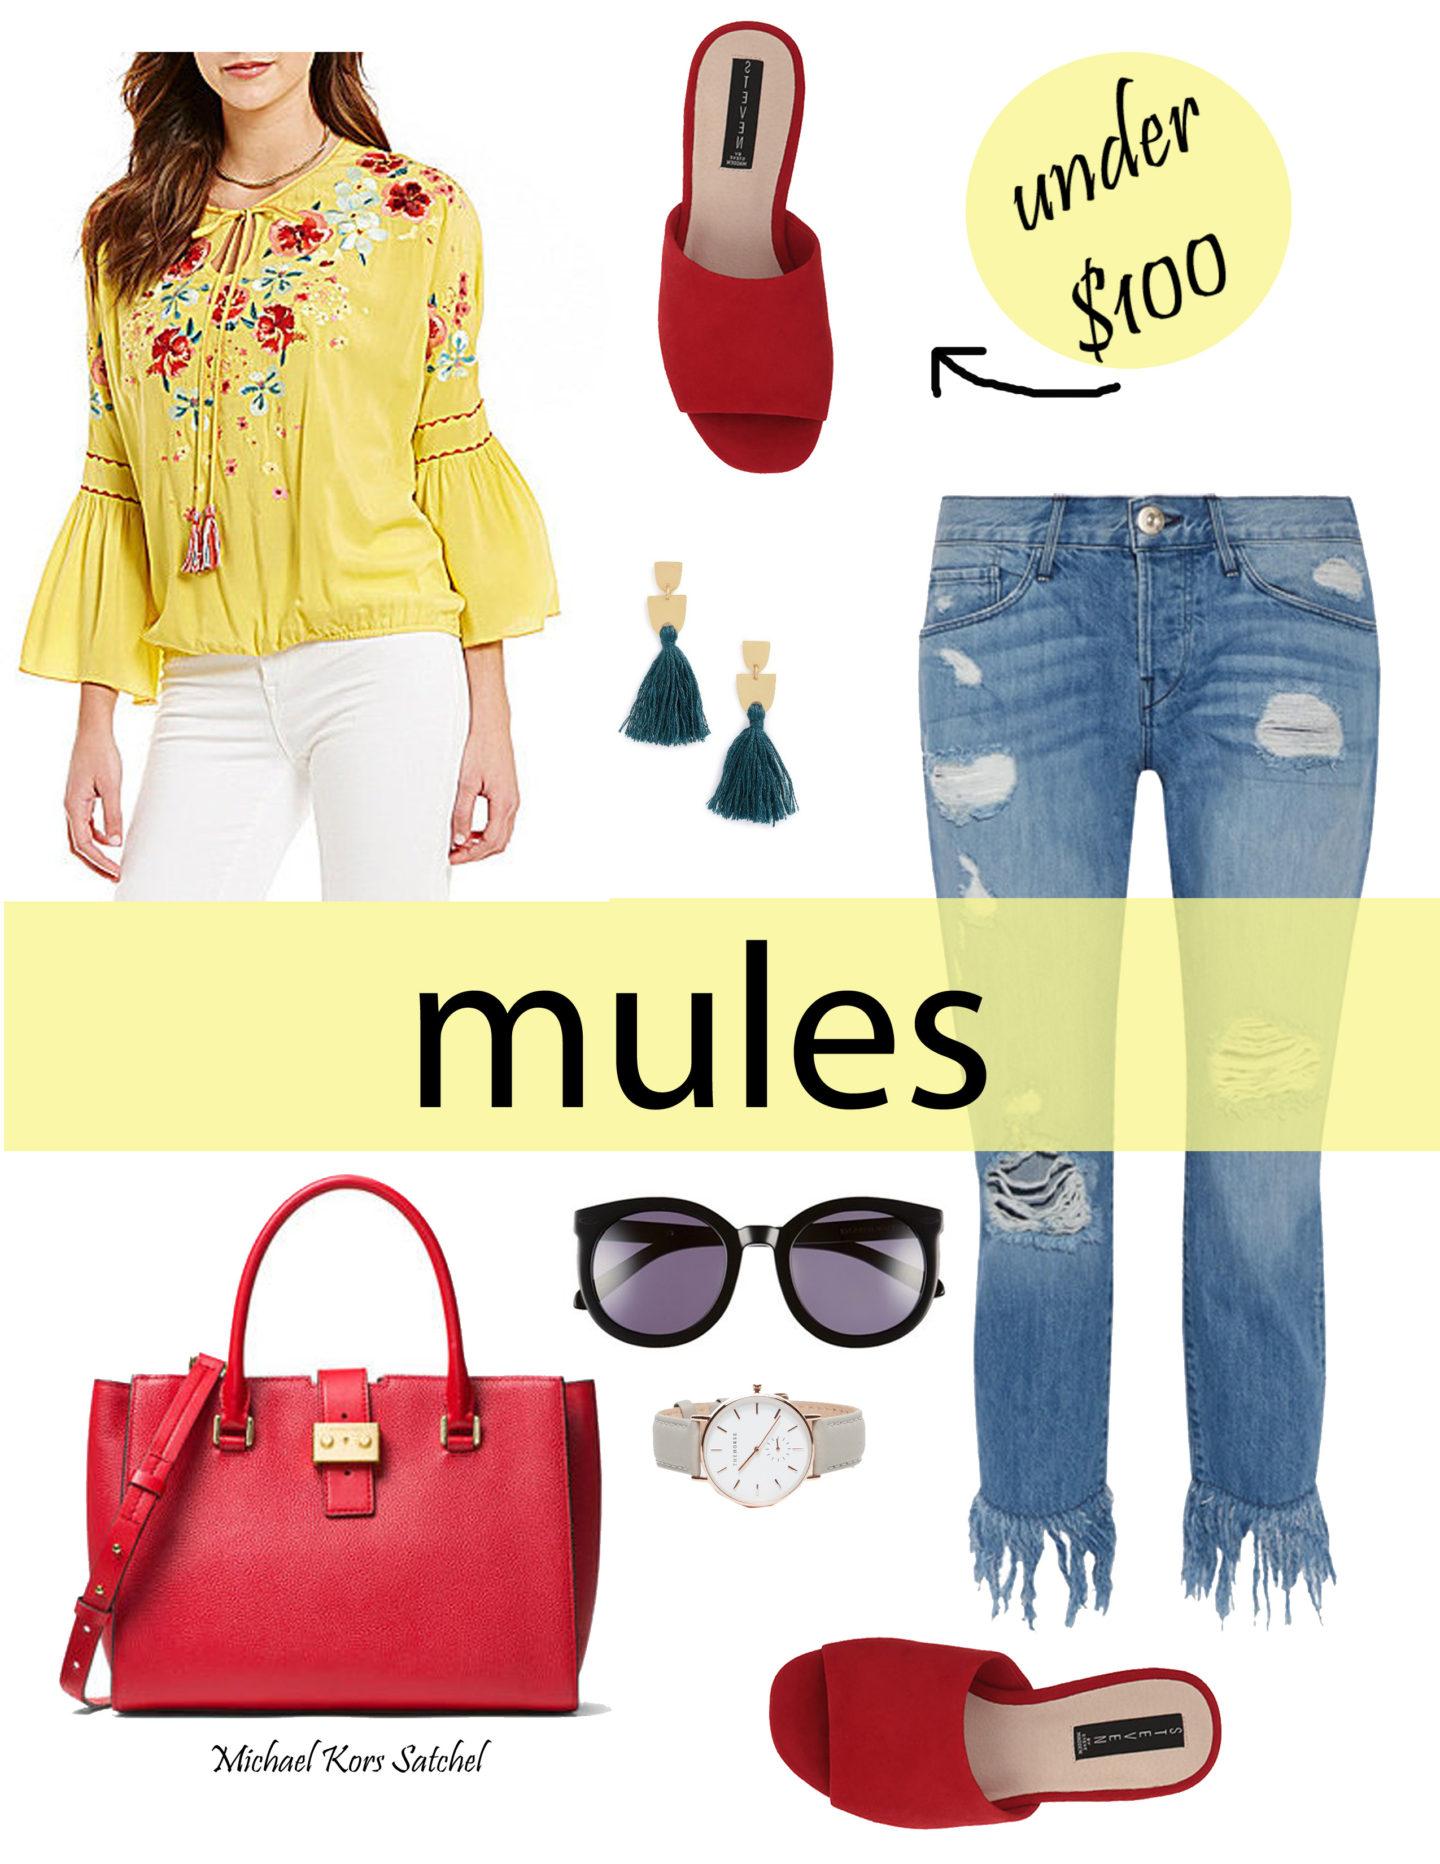 red steve madden mules under $100